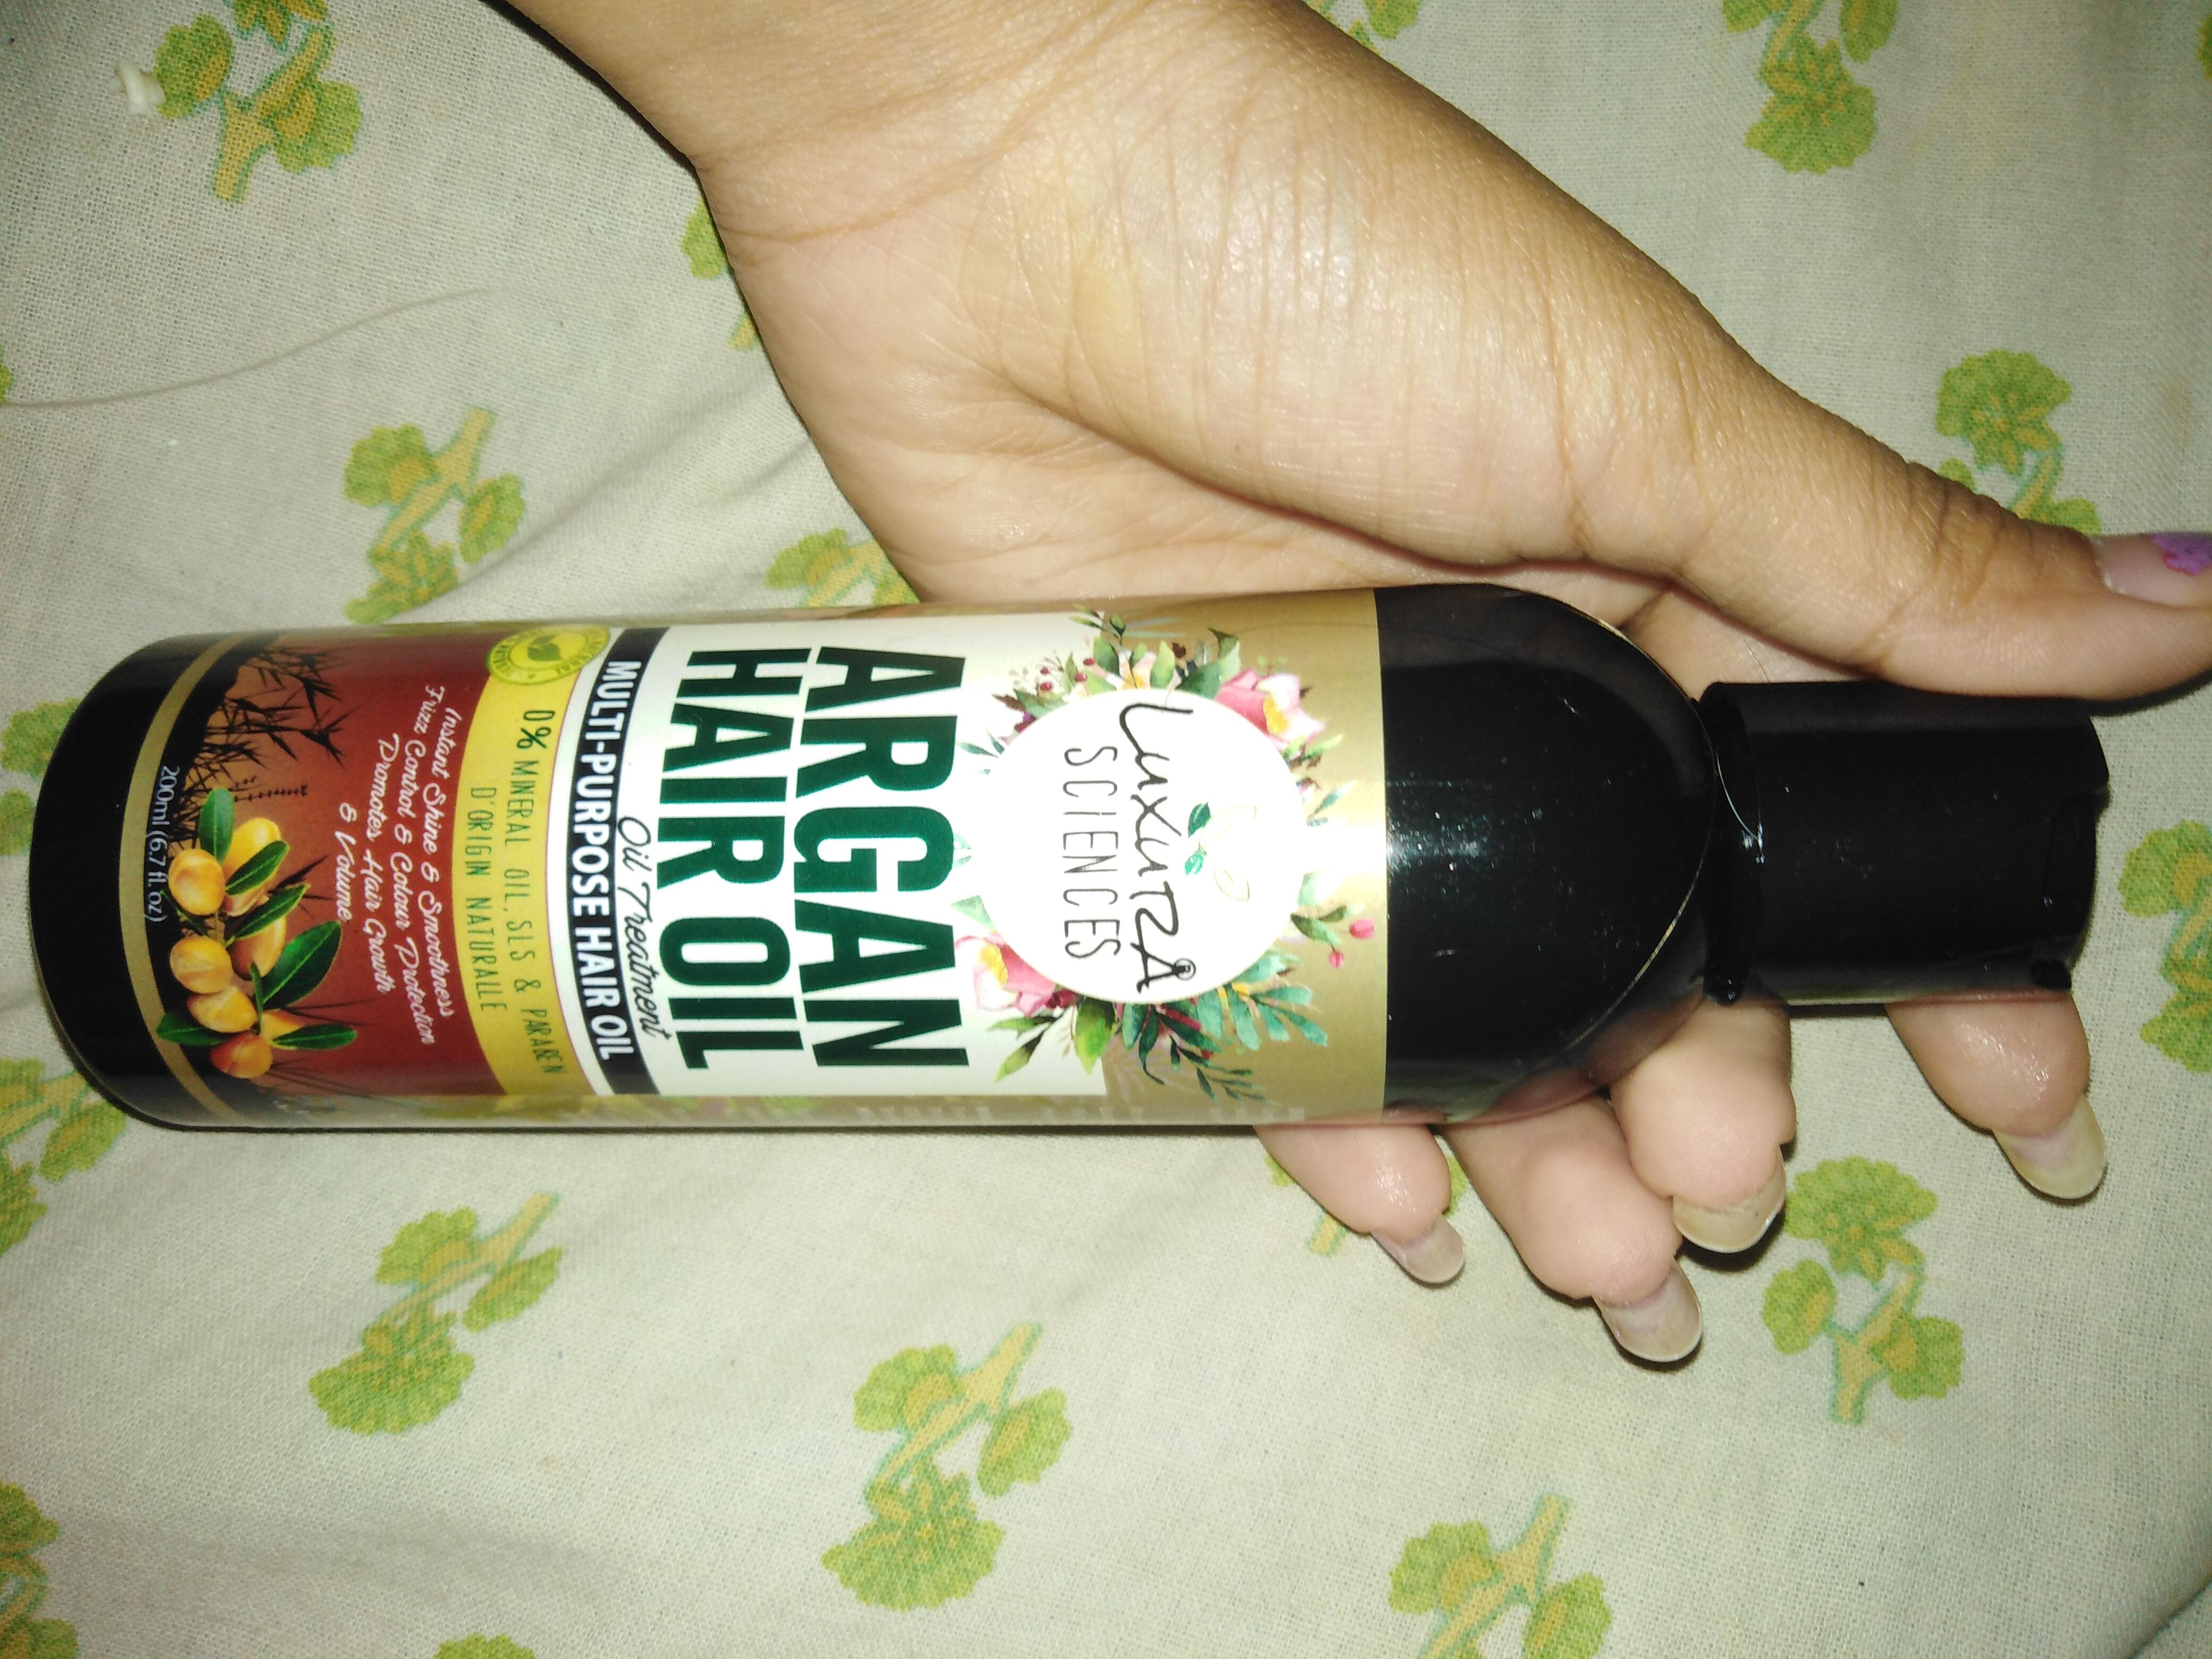 Luxura Sciences Argan Hair Oil 200 ml-Good product-By tarusha_jain